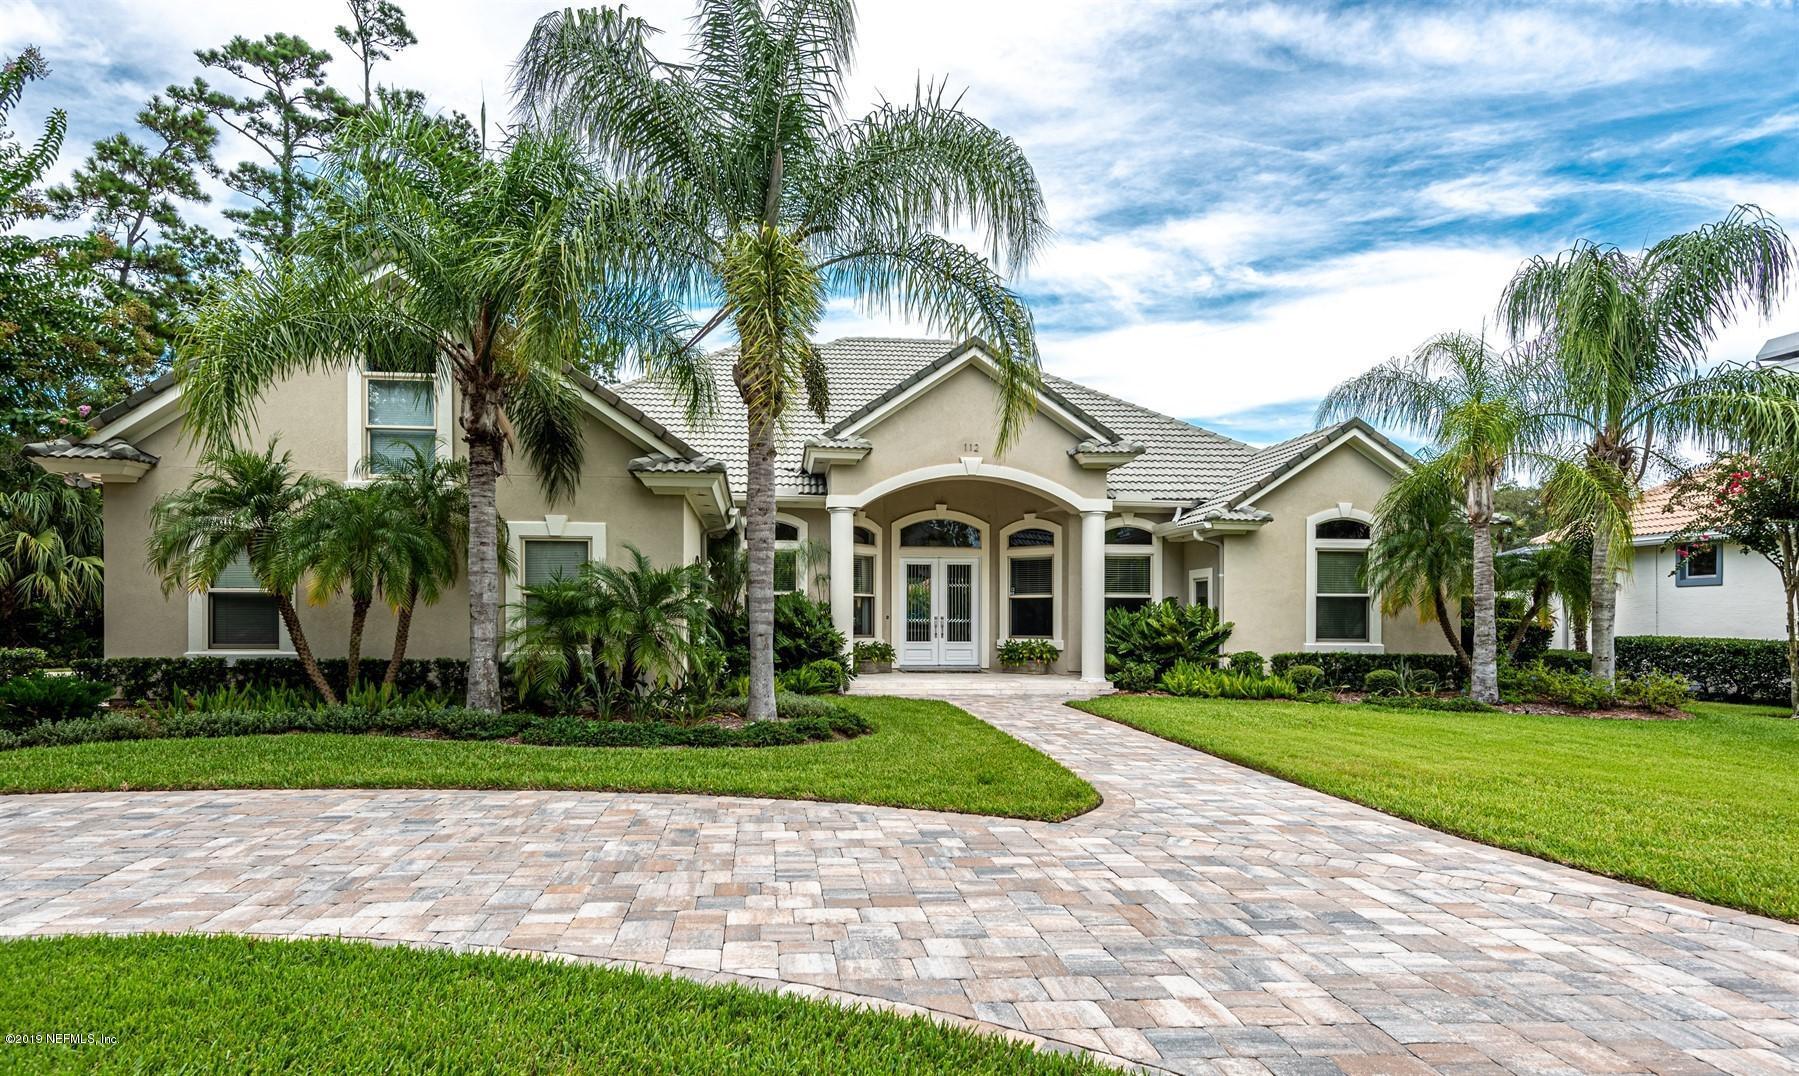 112 BROAD, PONTE VEDRA BEACH, FLORIDA 32082, 4 Bedrooms Bedrooms, ,3 BathroomsBathrooms,Residential - single family,For sale,BROAD,1009519